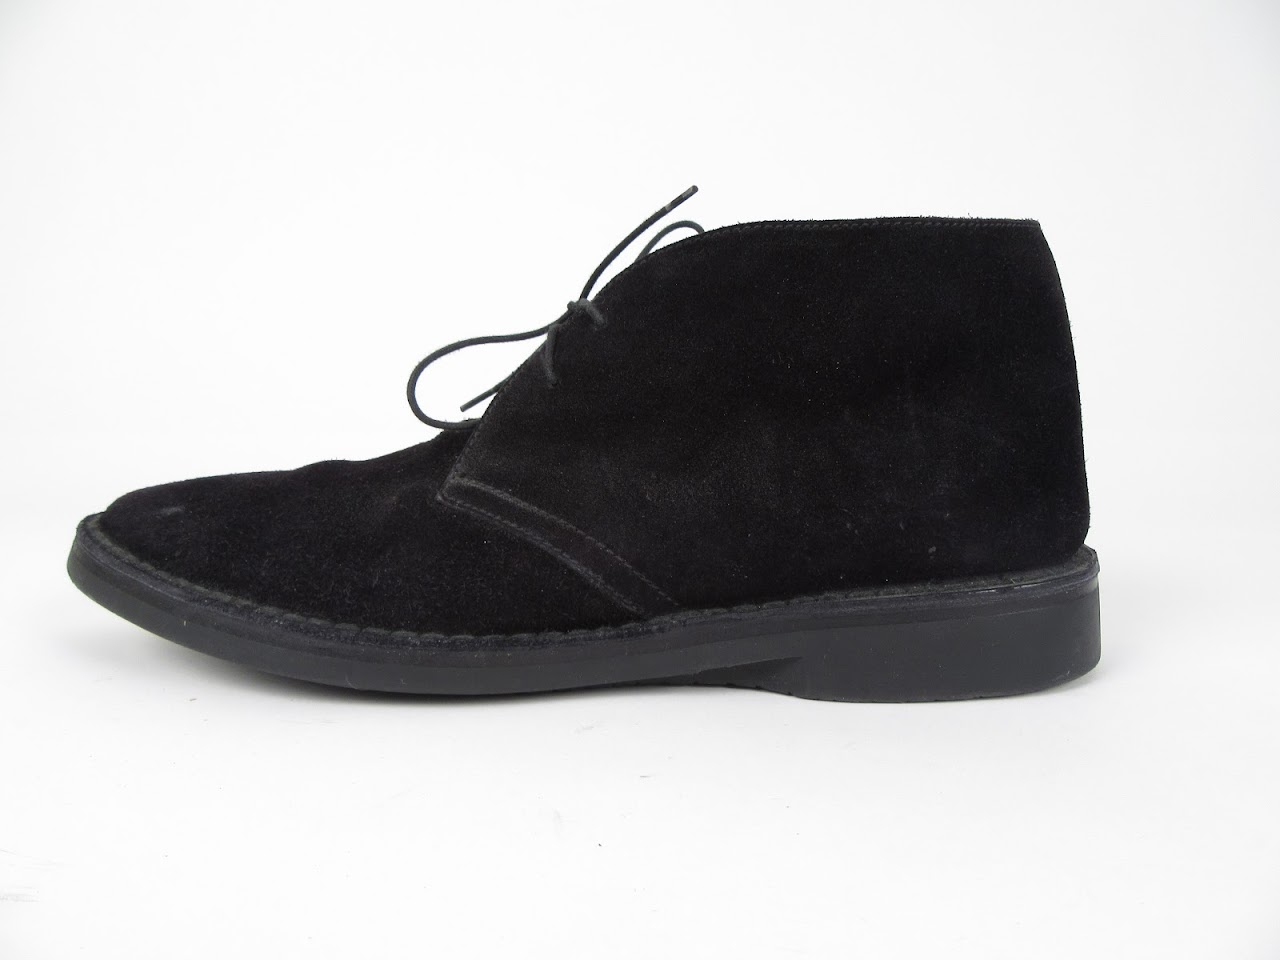 Prada Black Suede Chukka Boots